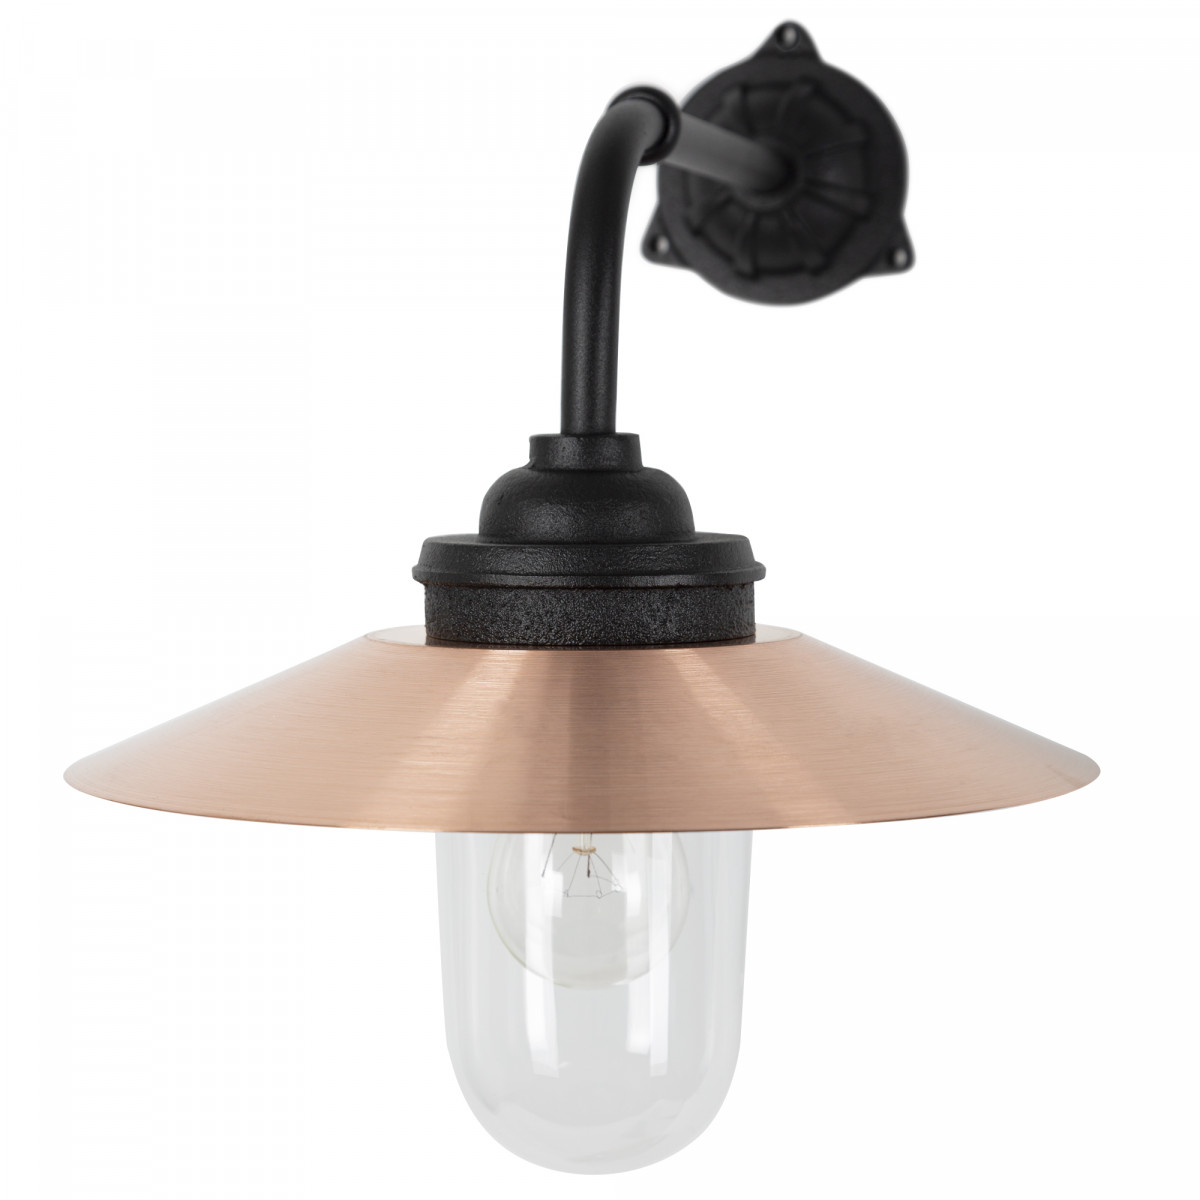 Stoere gietijzeren Stallamp Provence buitenlamp  Zwart & Koper